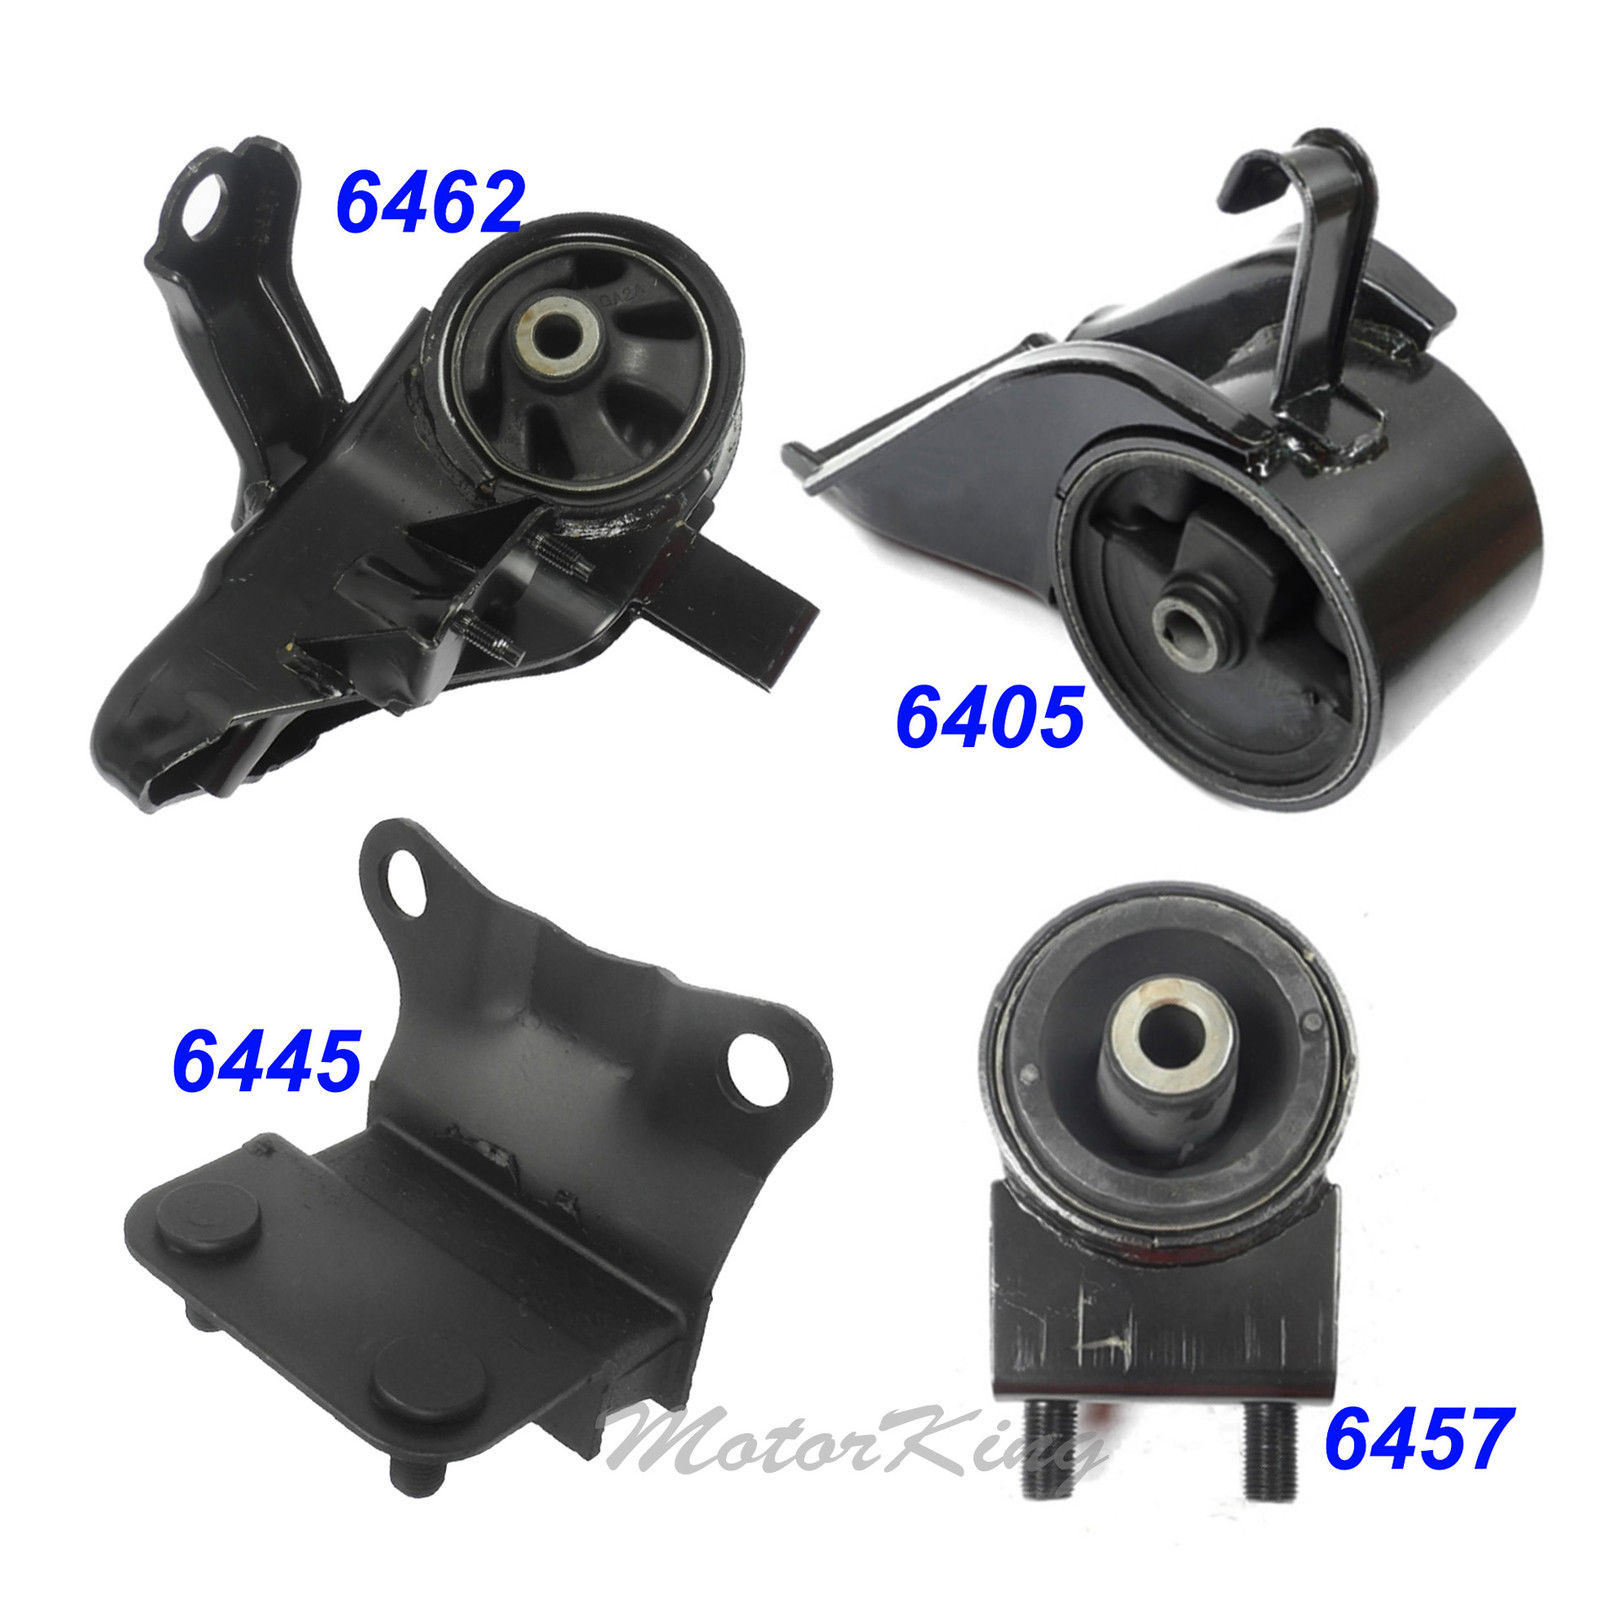 93-97 For Mazda MX-6 2.5L Engine Motor & Trans Mount Manual 6405 6445 6457  6462